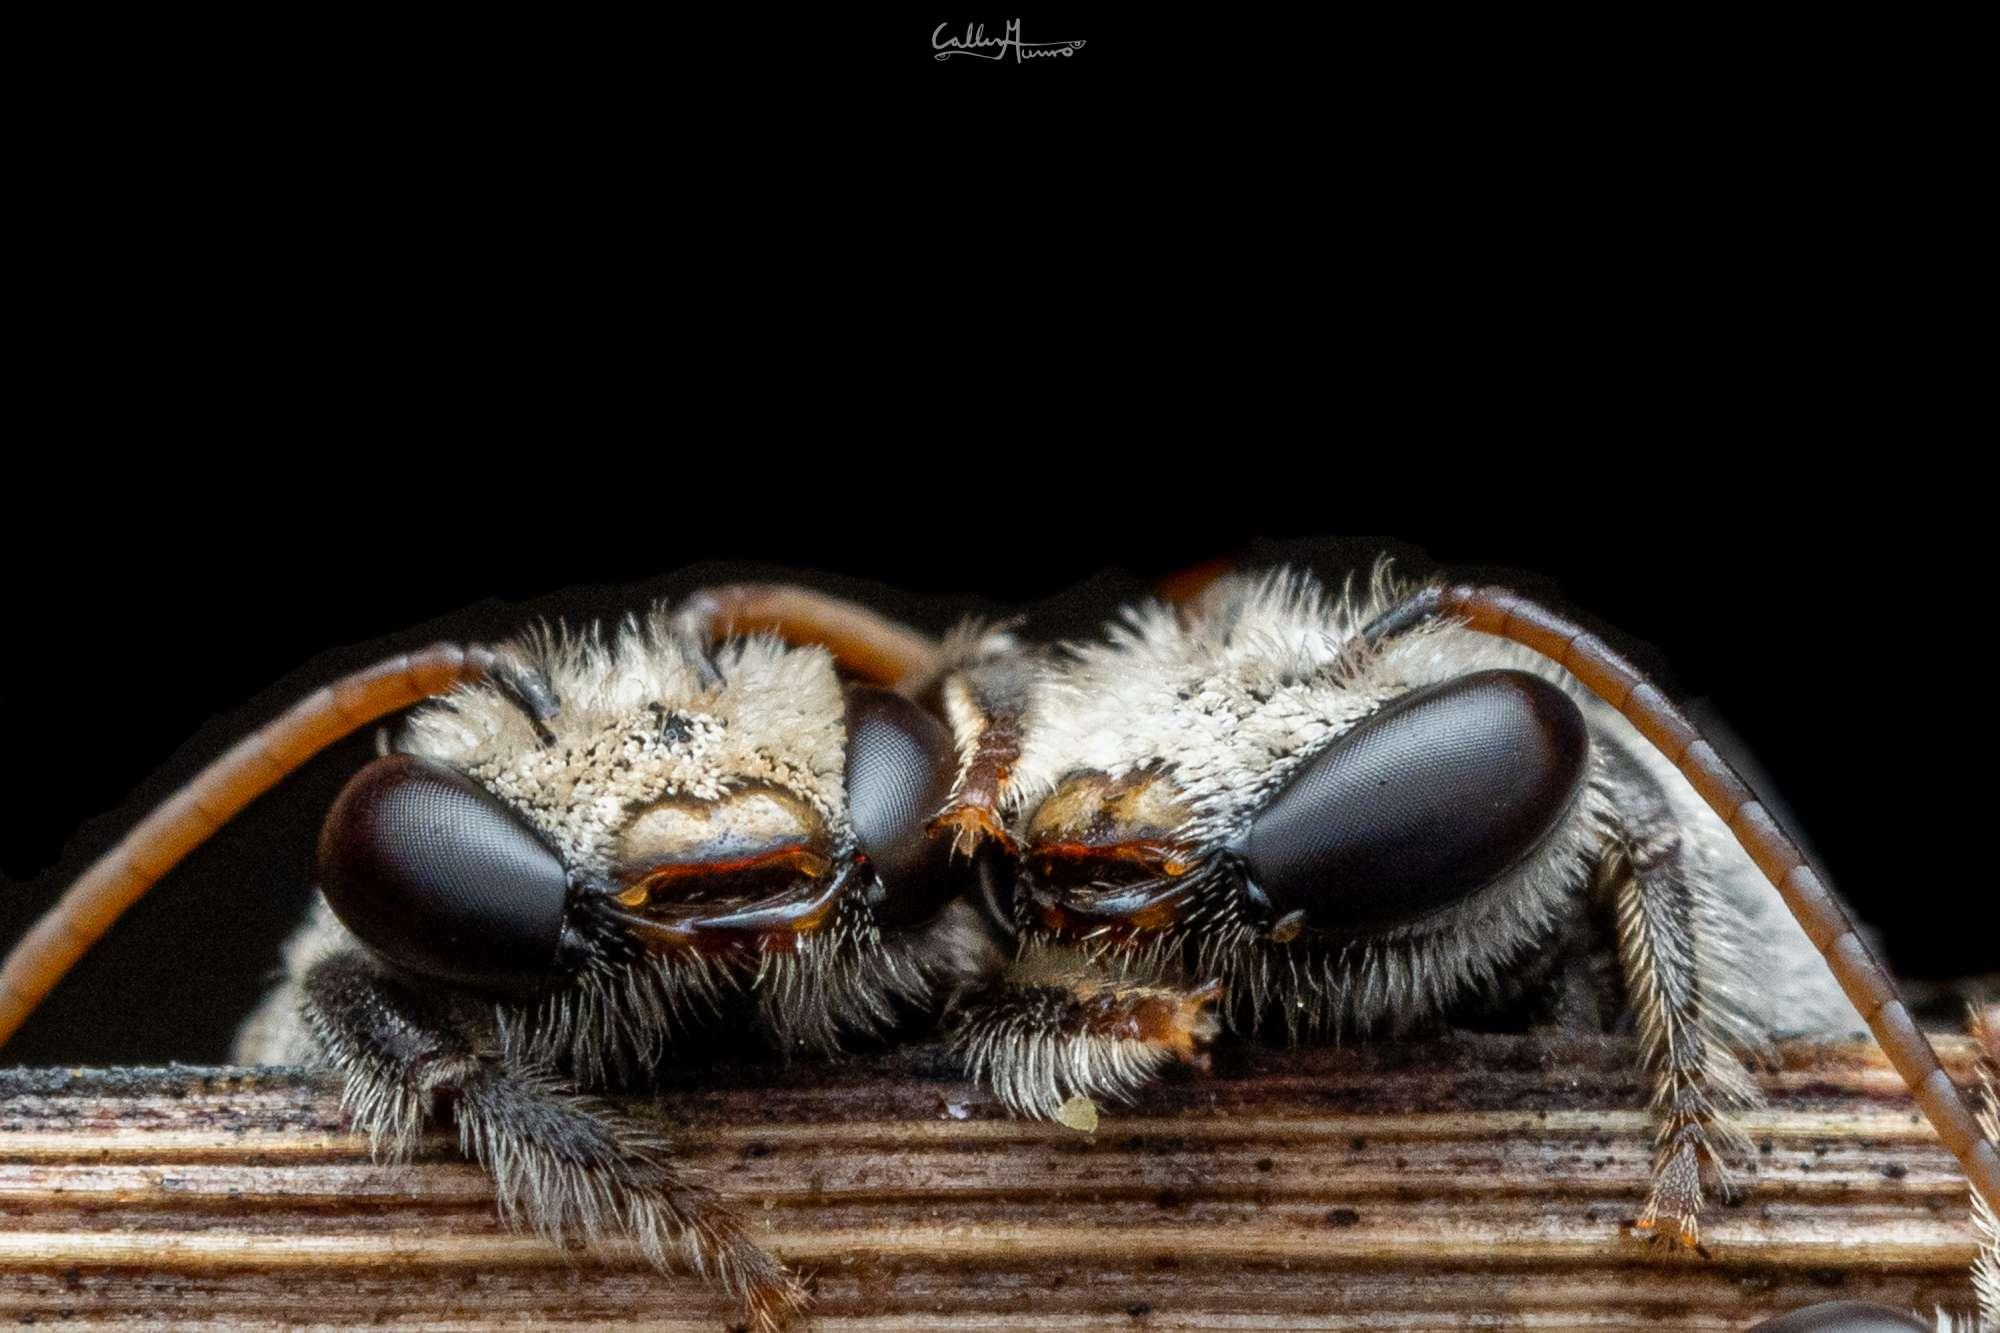 Bees Macro Photography closeup of Ctenocolletes species